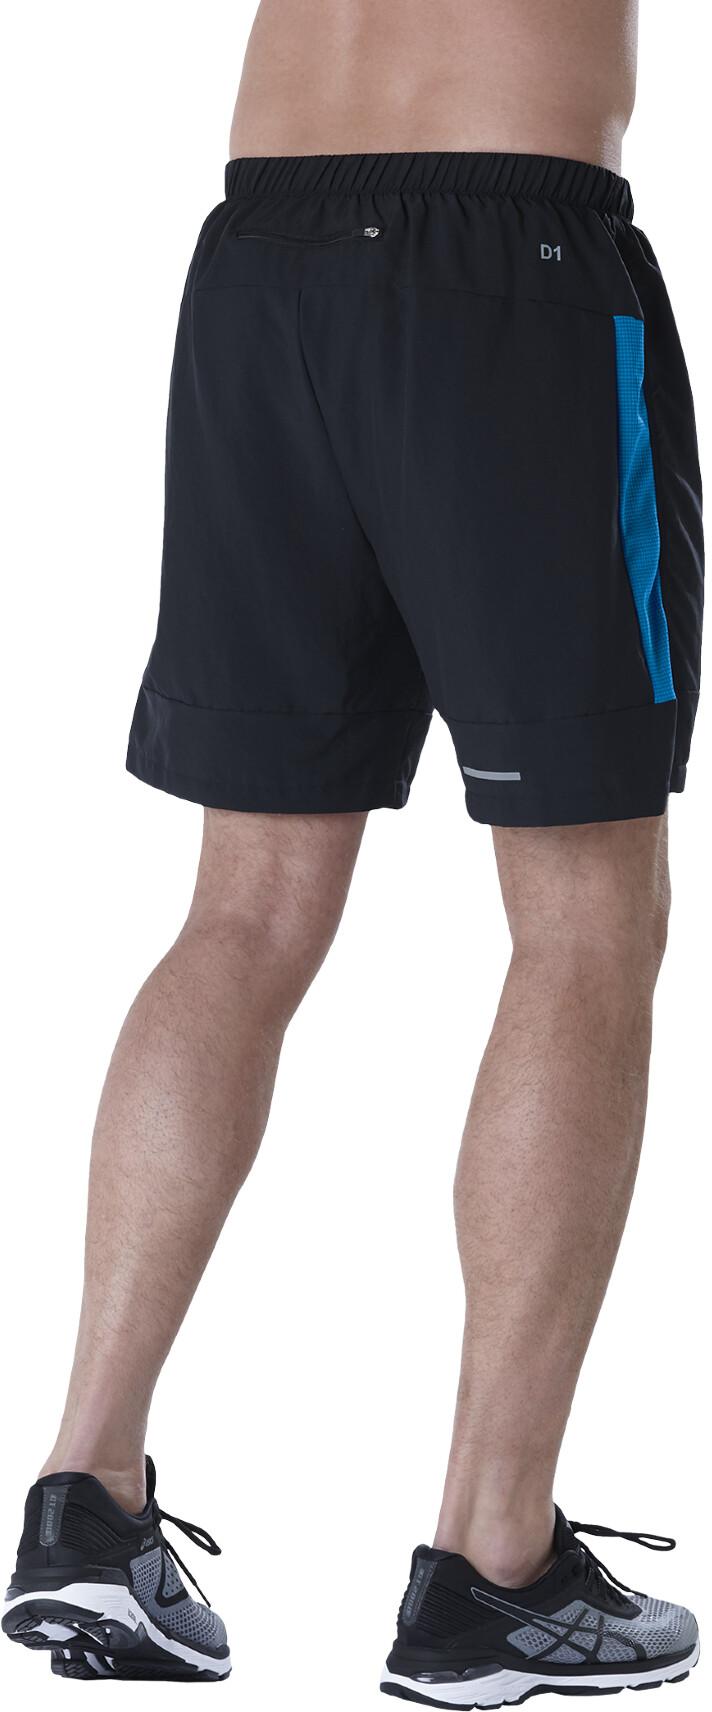 HombrePerformance 7in Blackdirectoire Pantalones Blue Asics Cortos 0nwP8kO